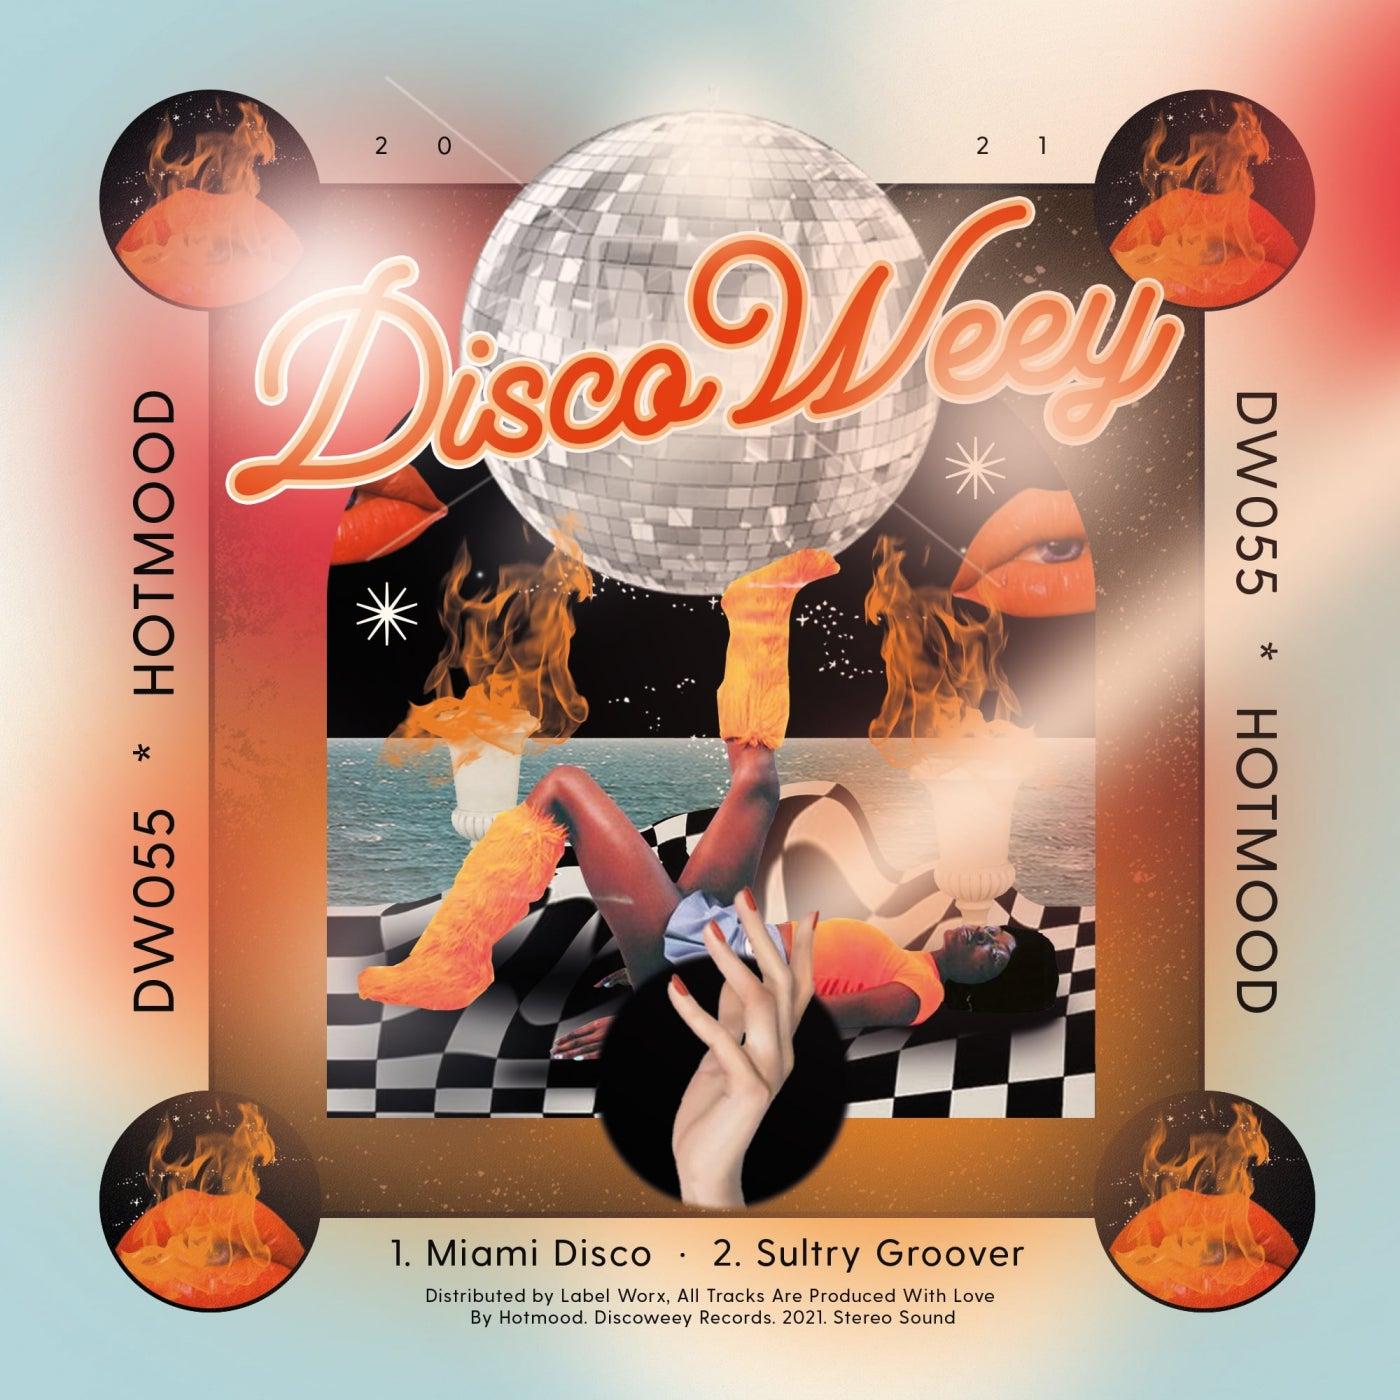 Miami Disco (Original Mix)